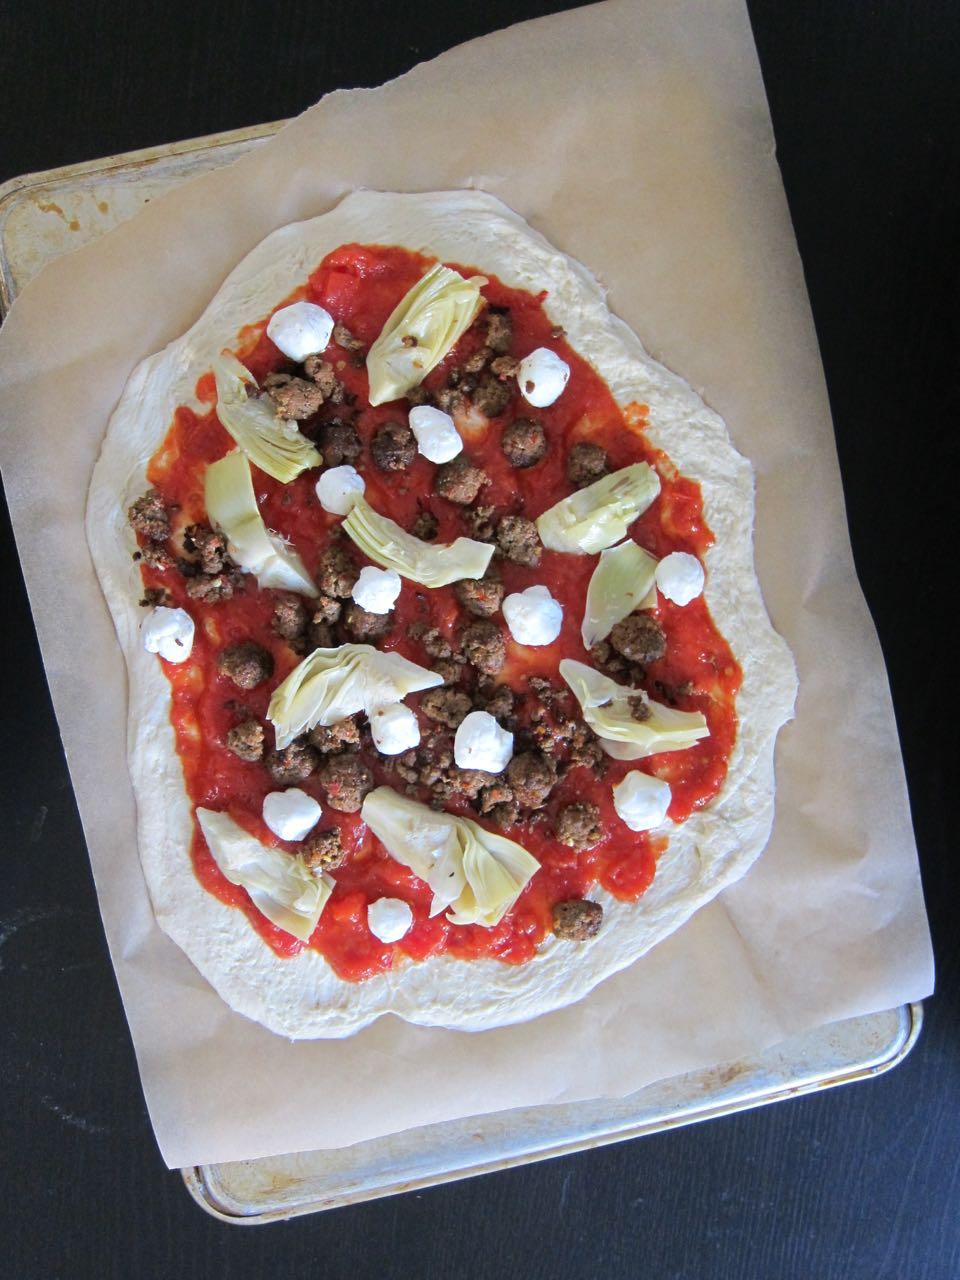 unbaked Merguez pizza